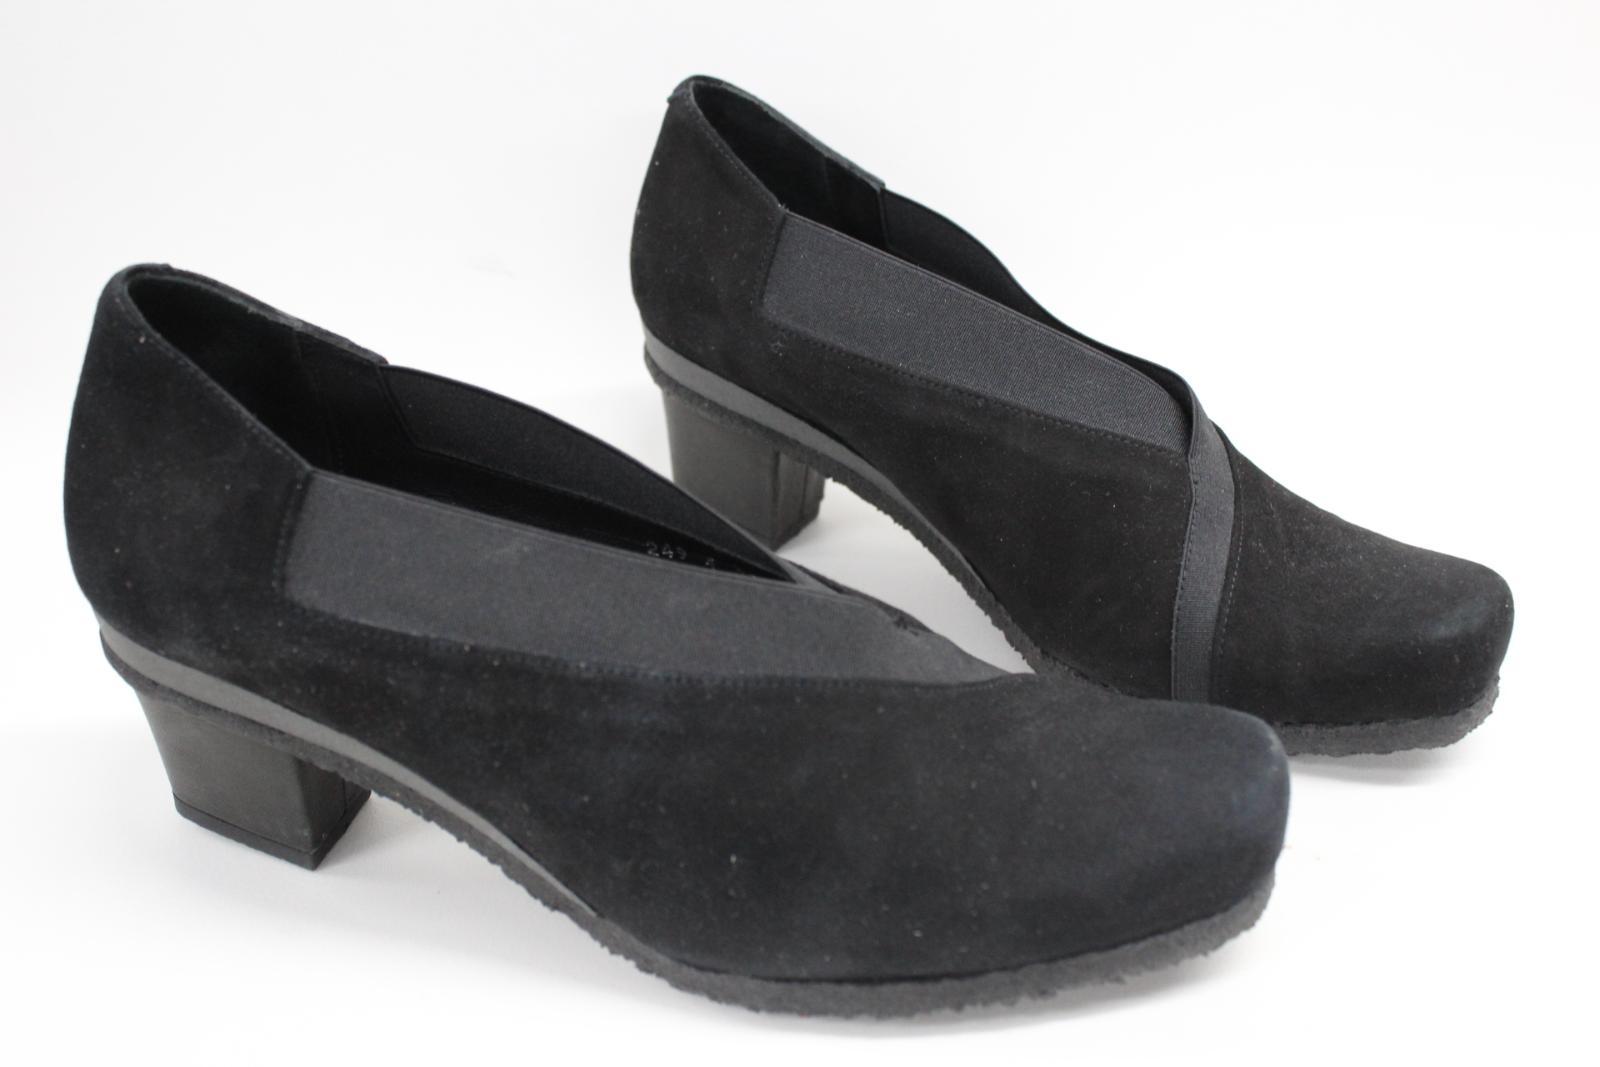 AUDLEY-London-Ladies-Black-Suede-Crossover-Block-Heels-Shoes-Size-EU39-UK6 thumbnail 11